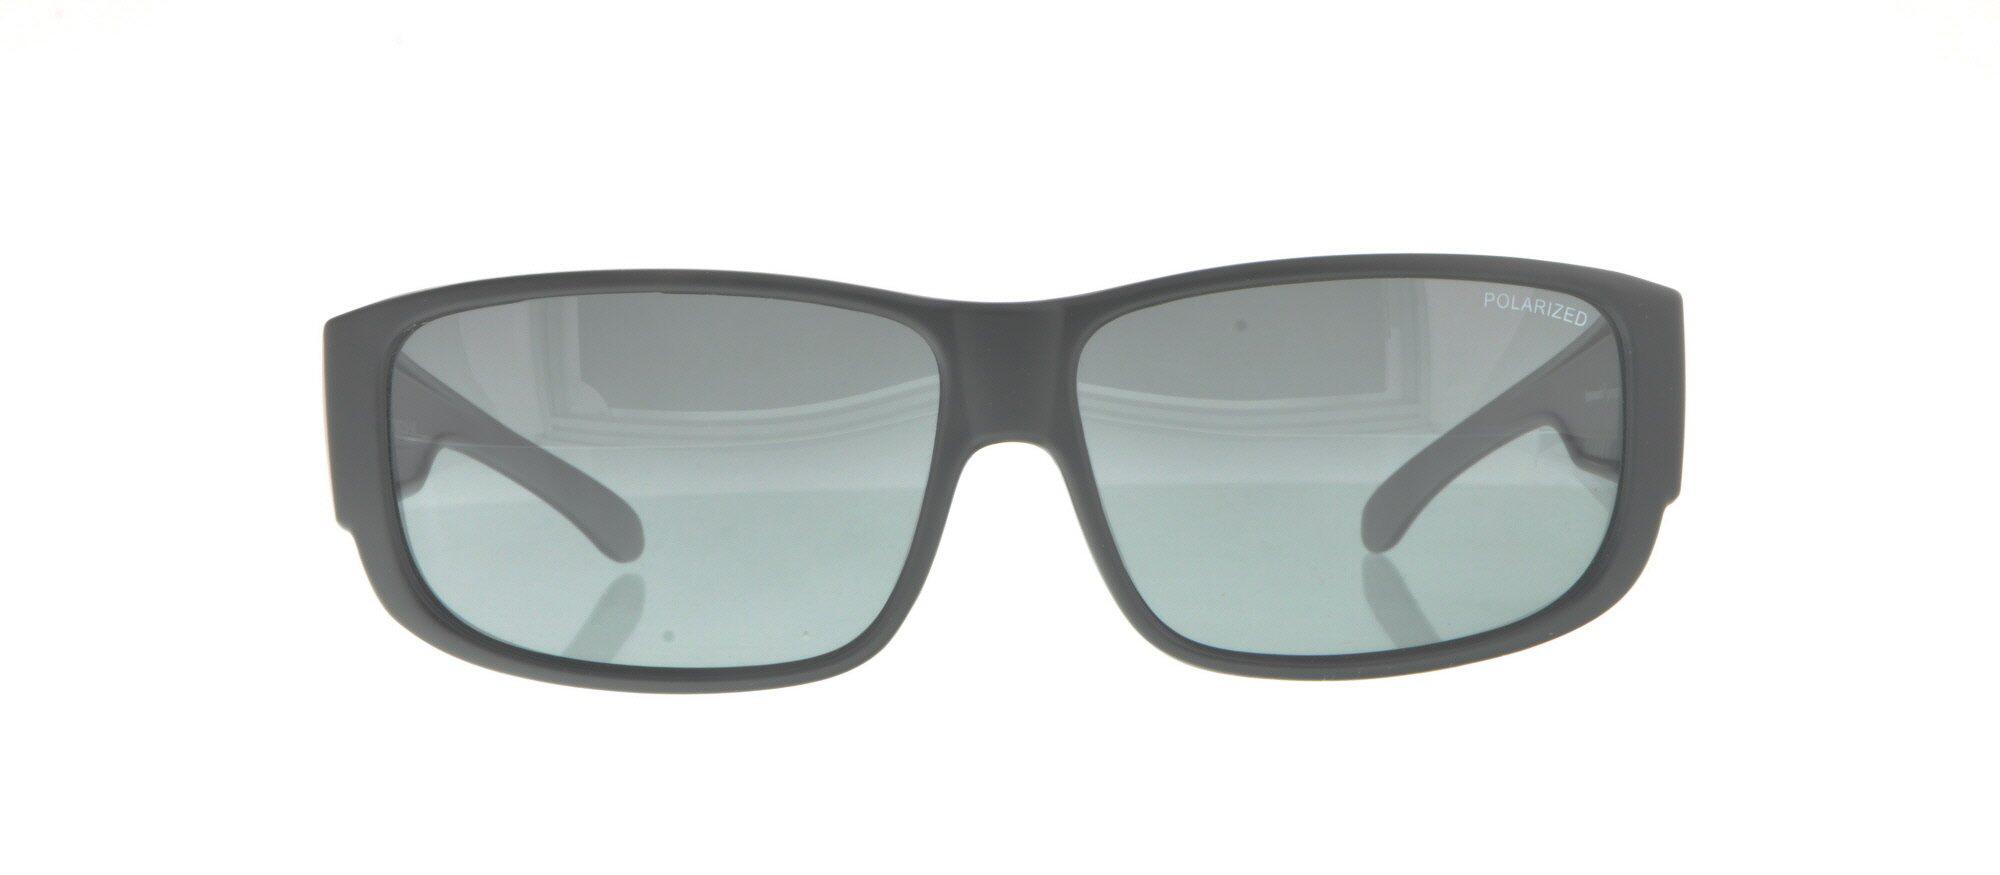 berzieh sonnenbrille 96 582205 brillen lesebrillen. Black Bedroom Furniture Sets. Home Design Ideas